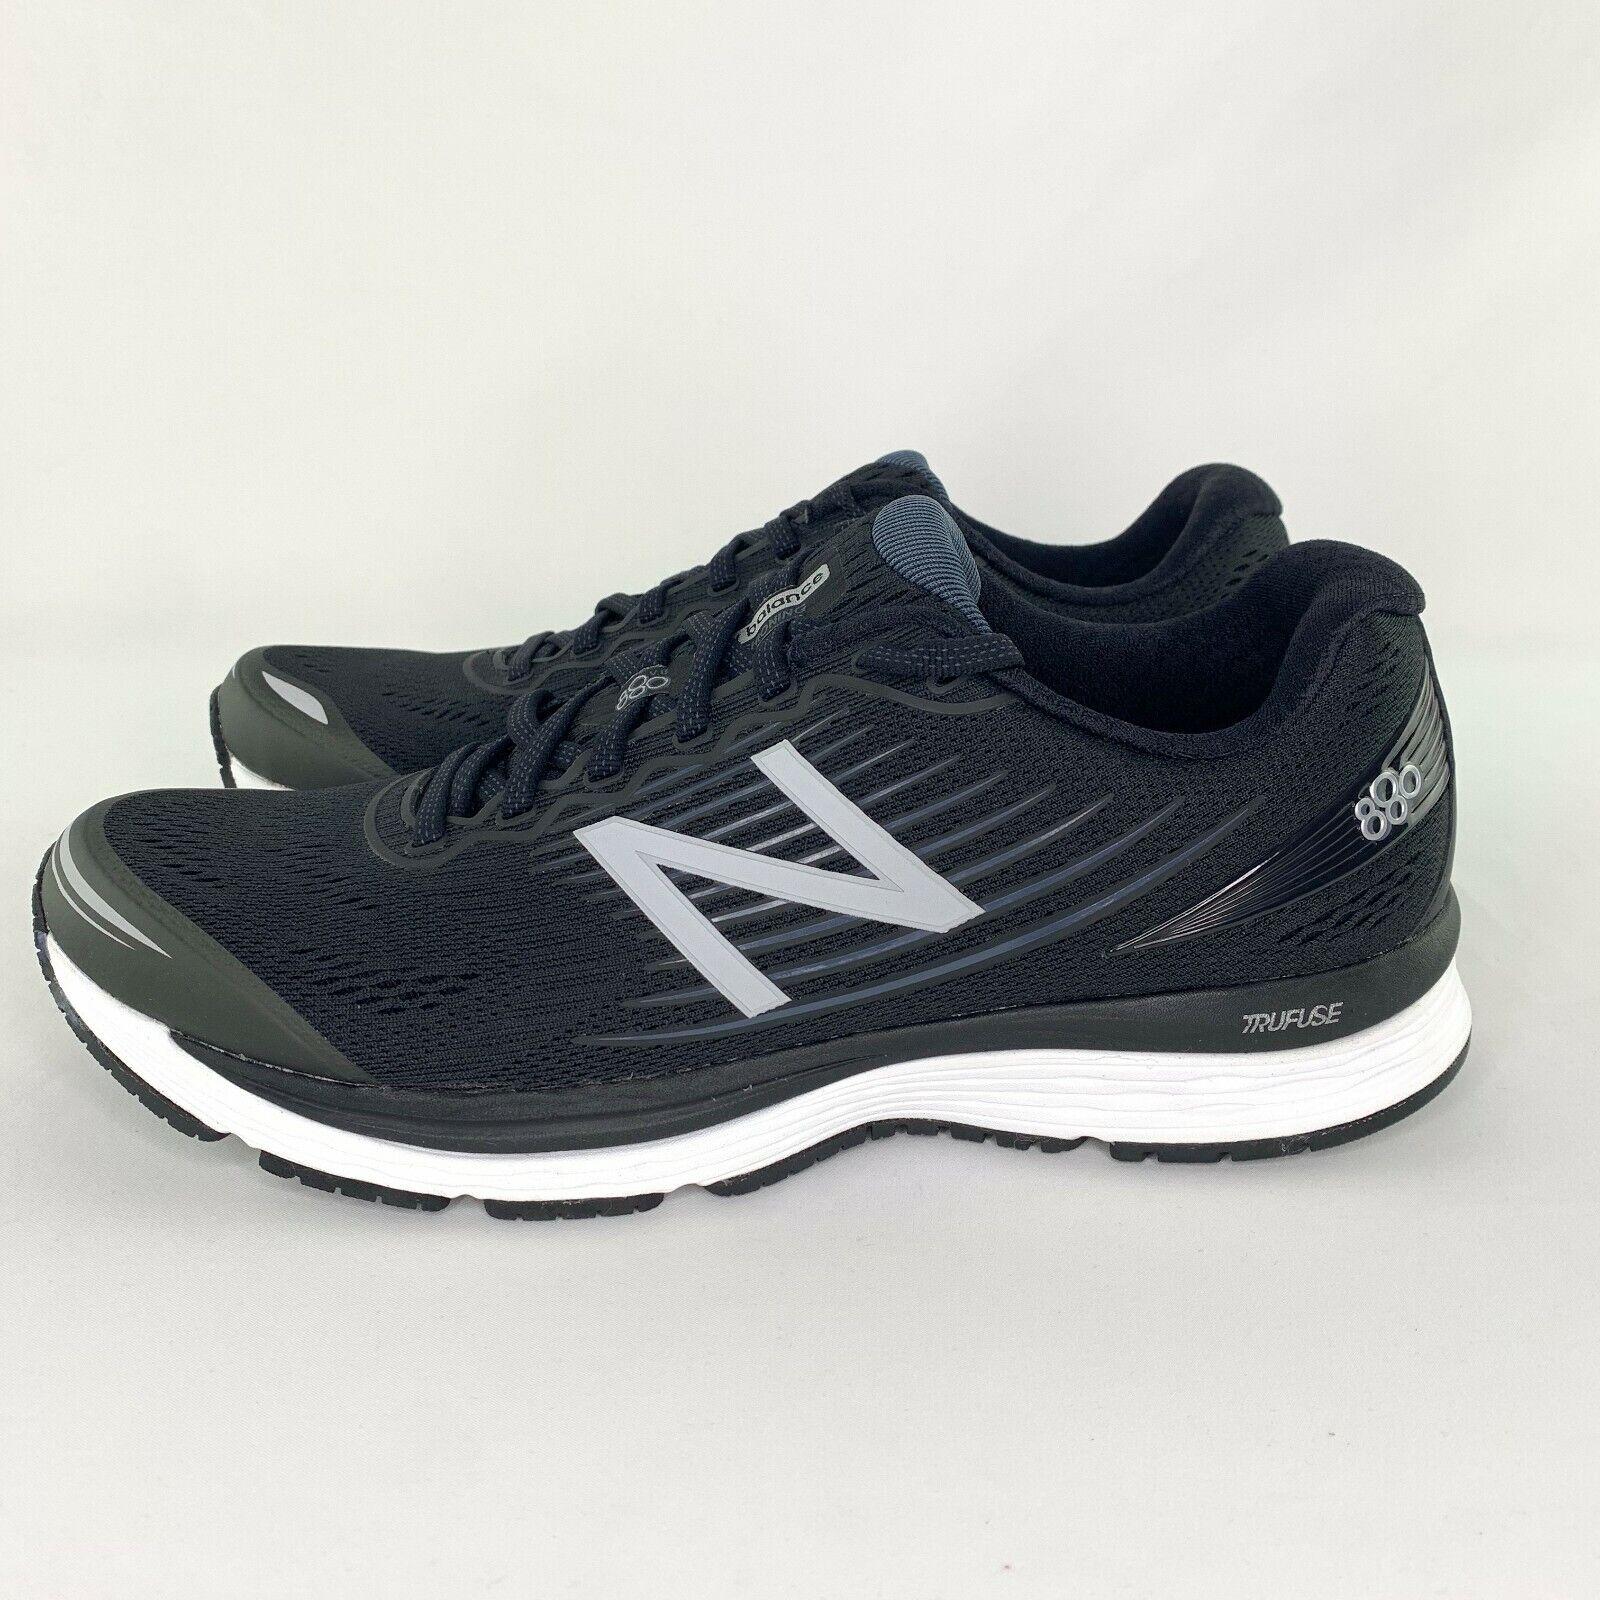 New Balance M880BK8 880v8 Mens Running shoes Size 12